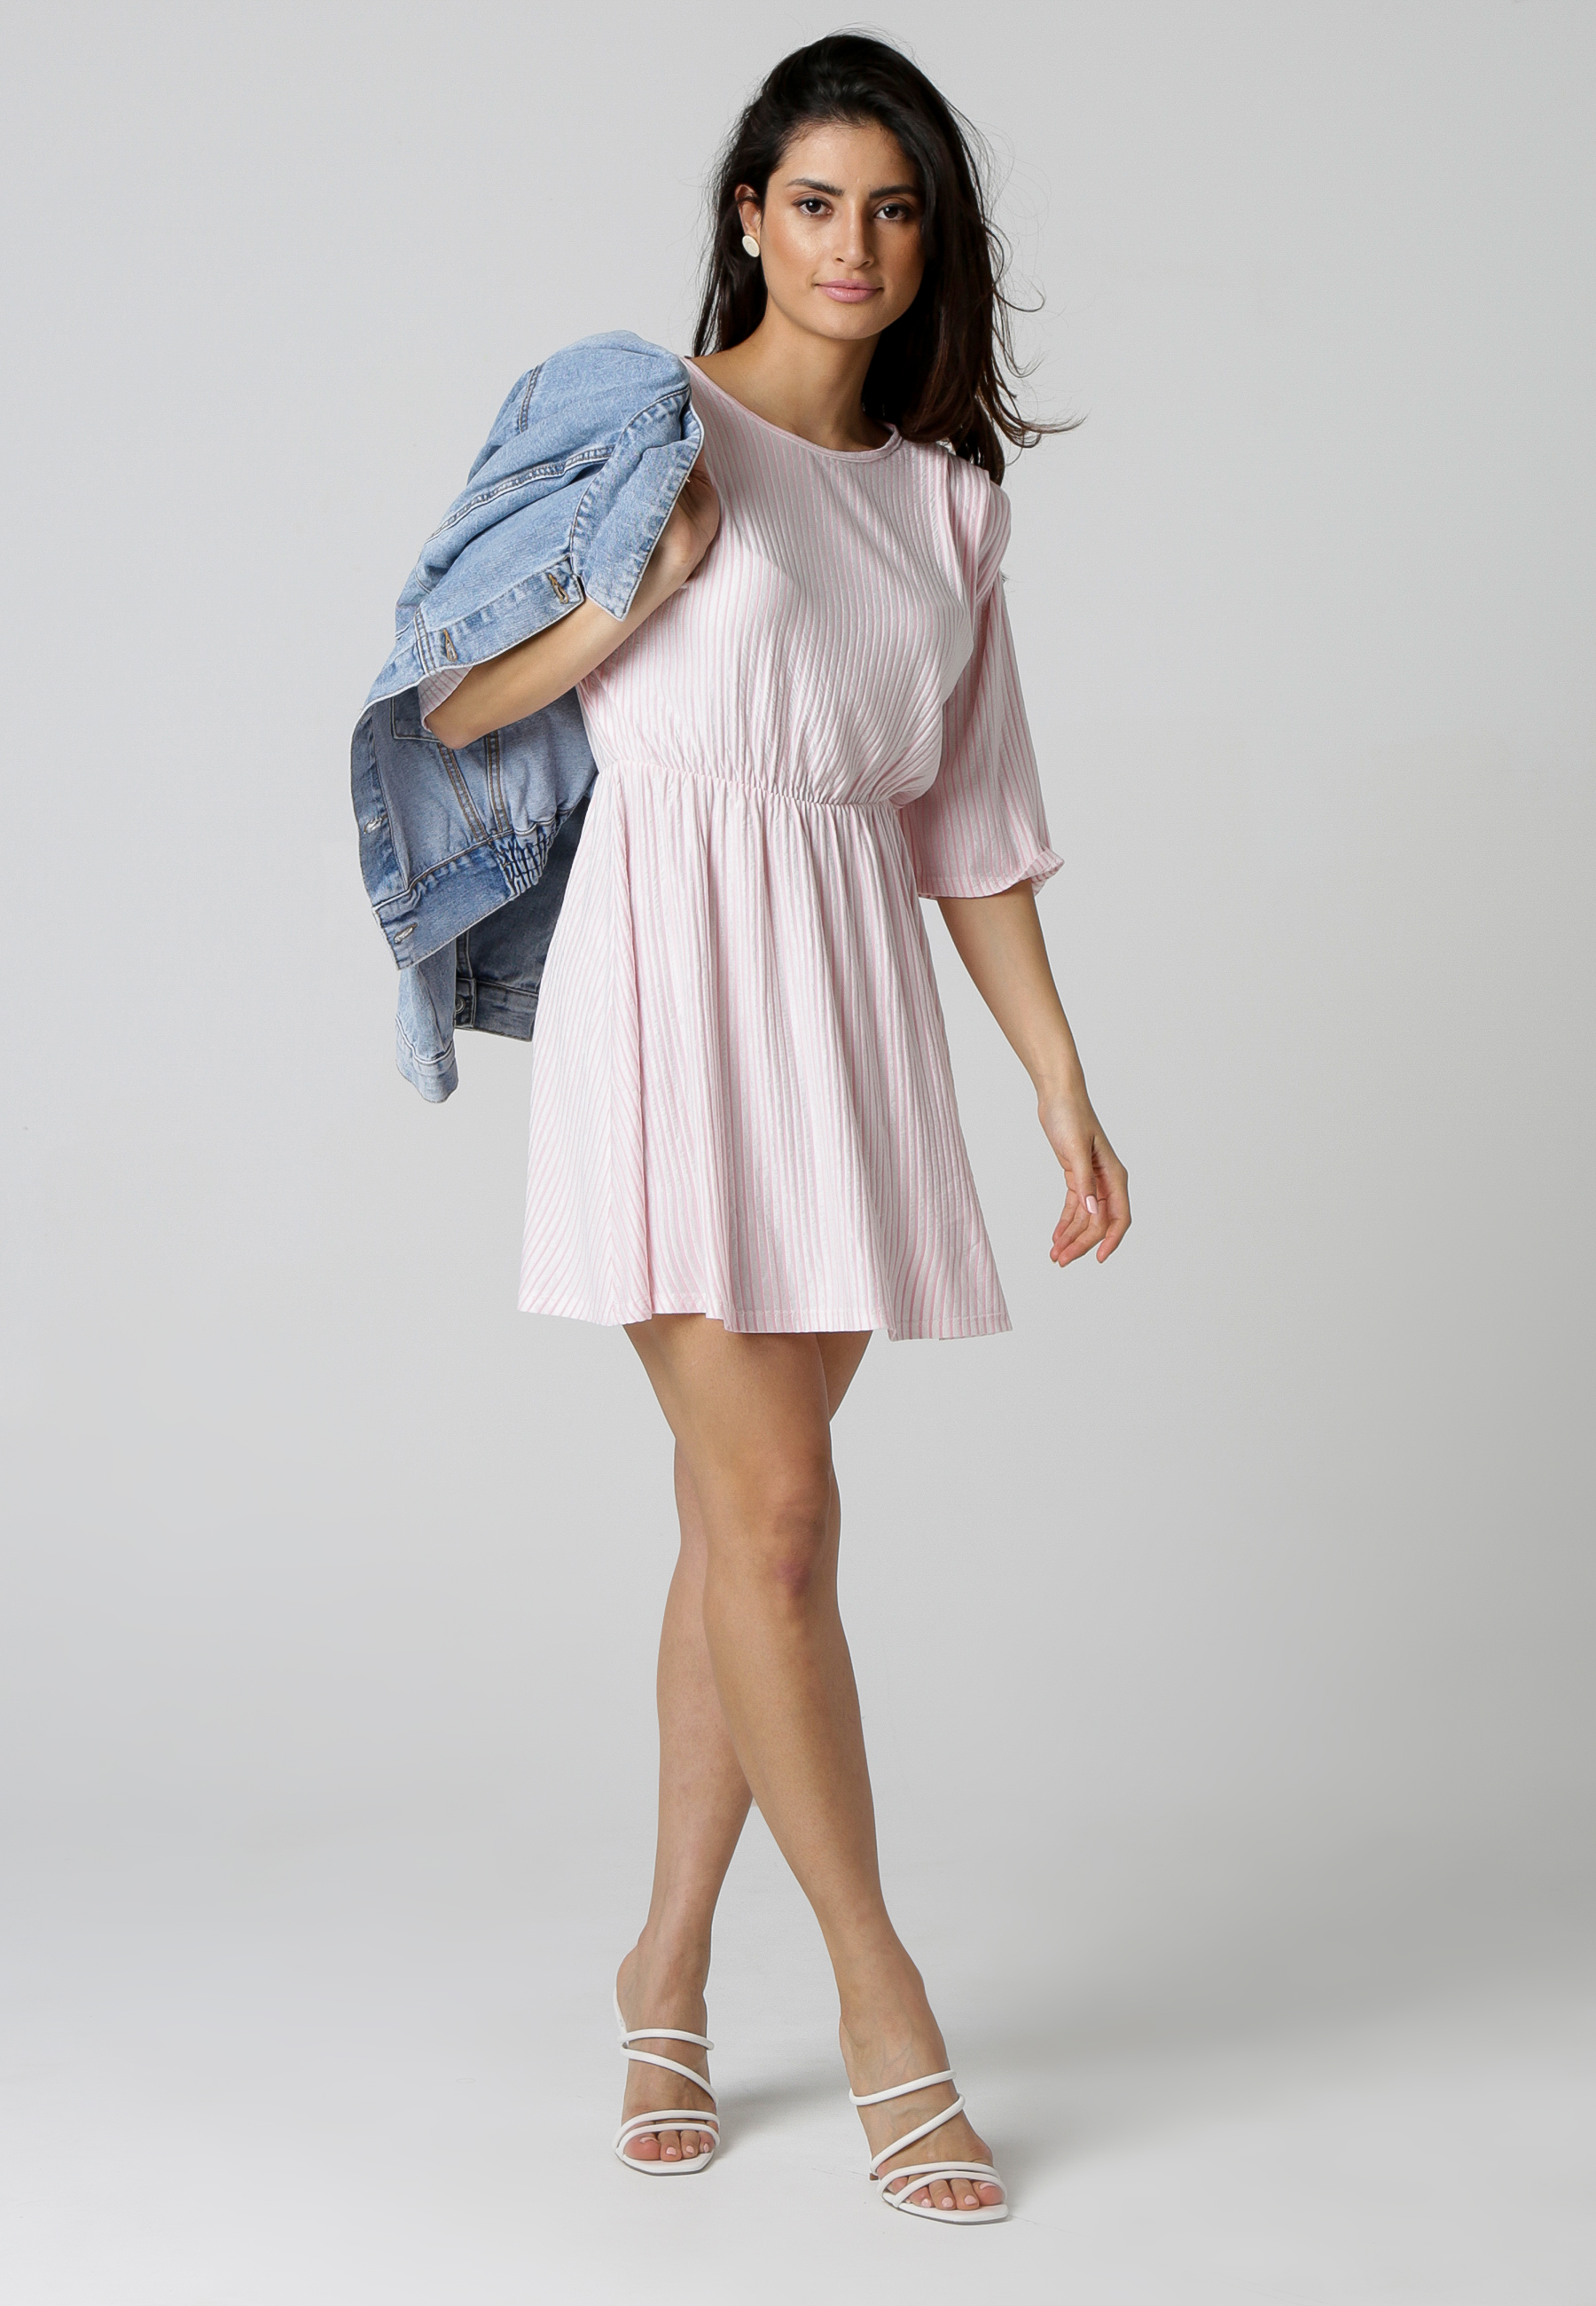 MiaZAYA Kleid Streifen